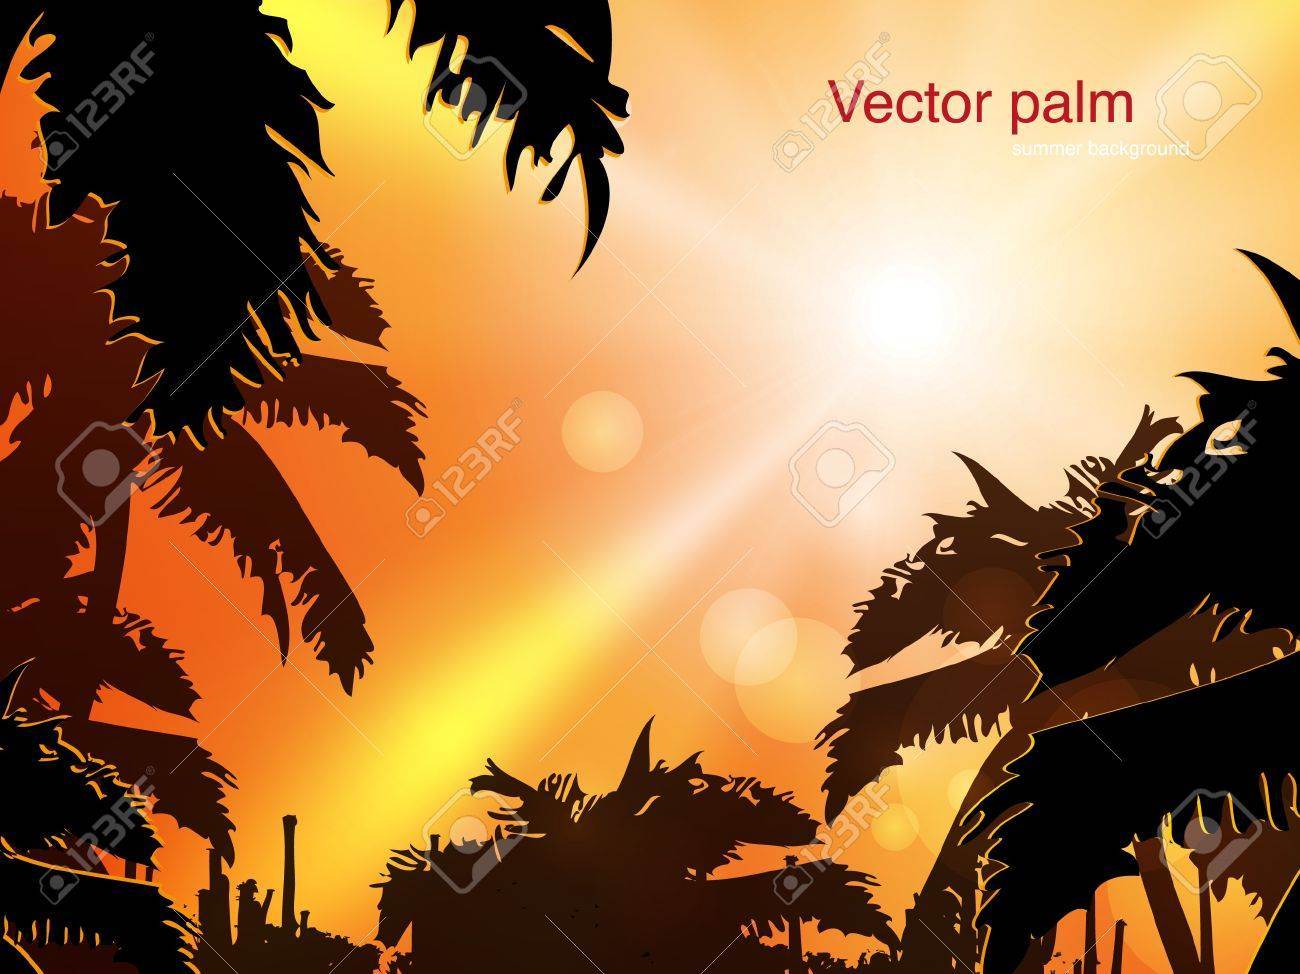 Jungle at sunset background illustration Stock Vector - 14178547